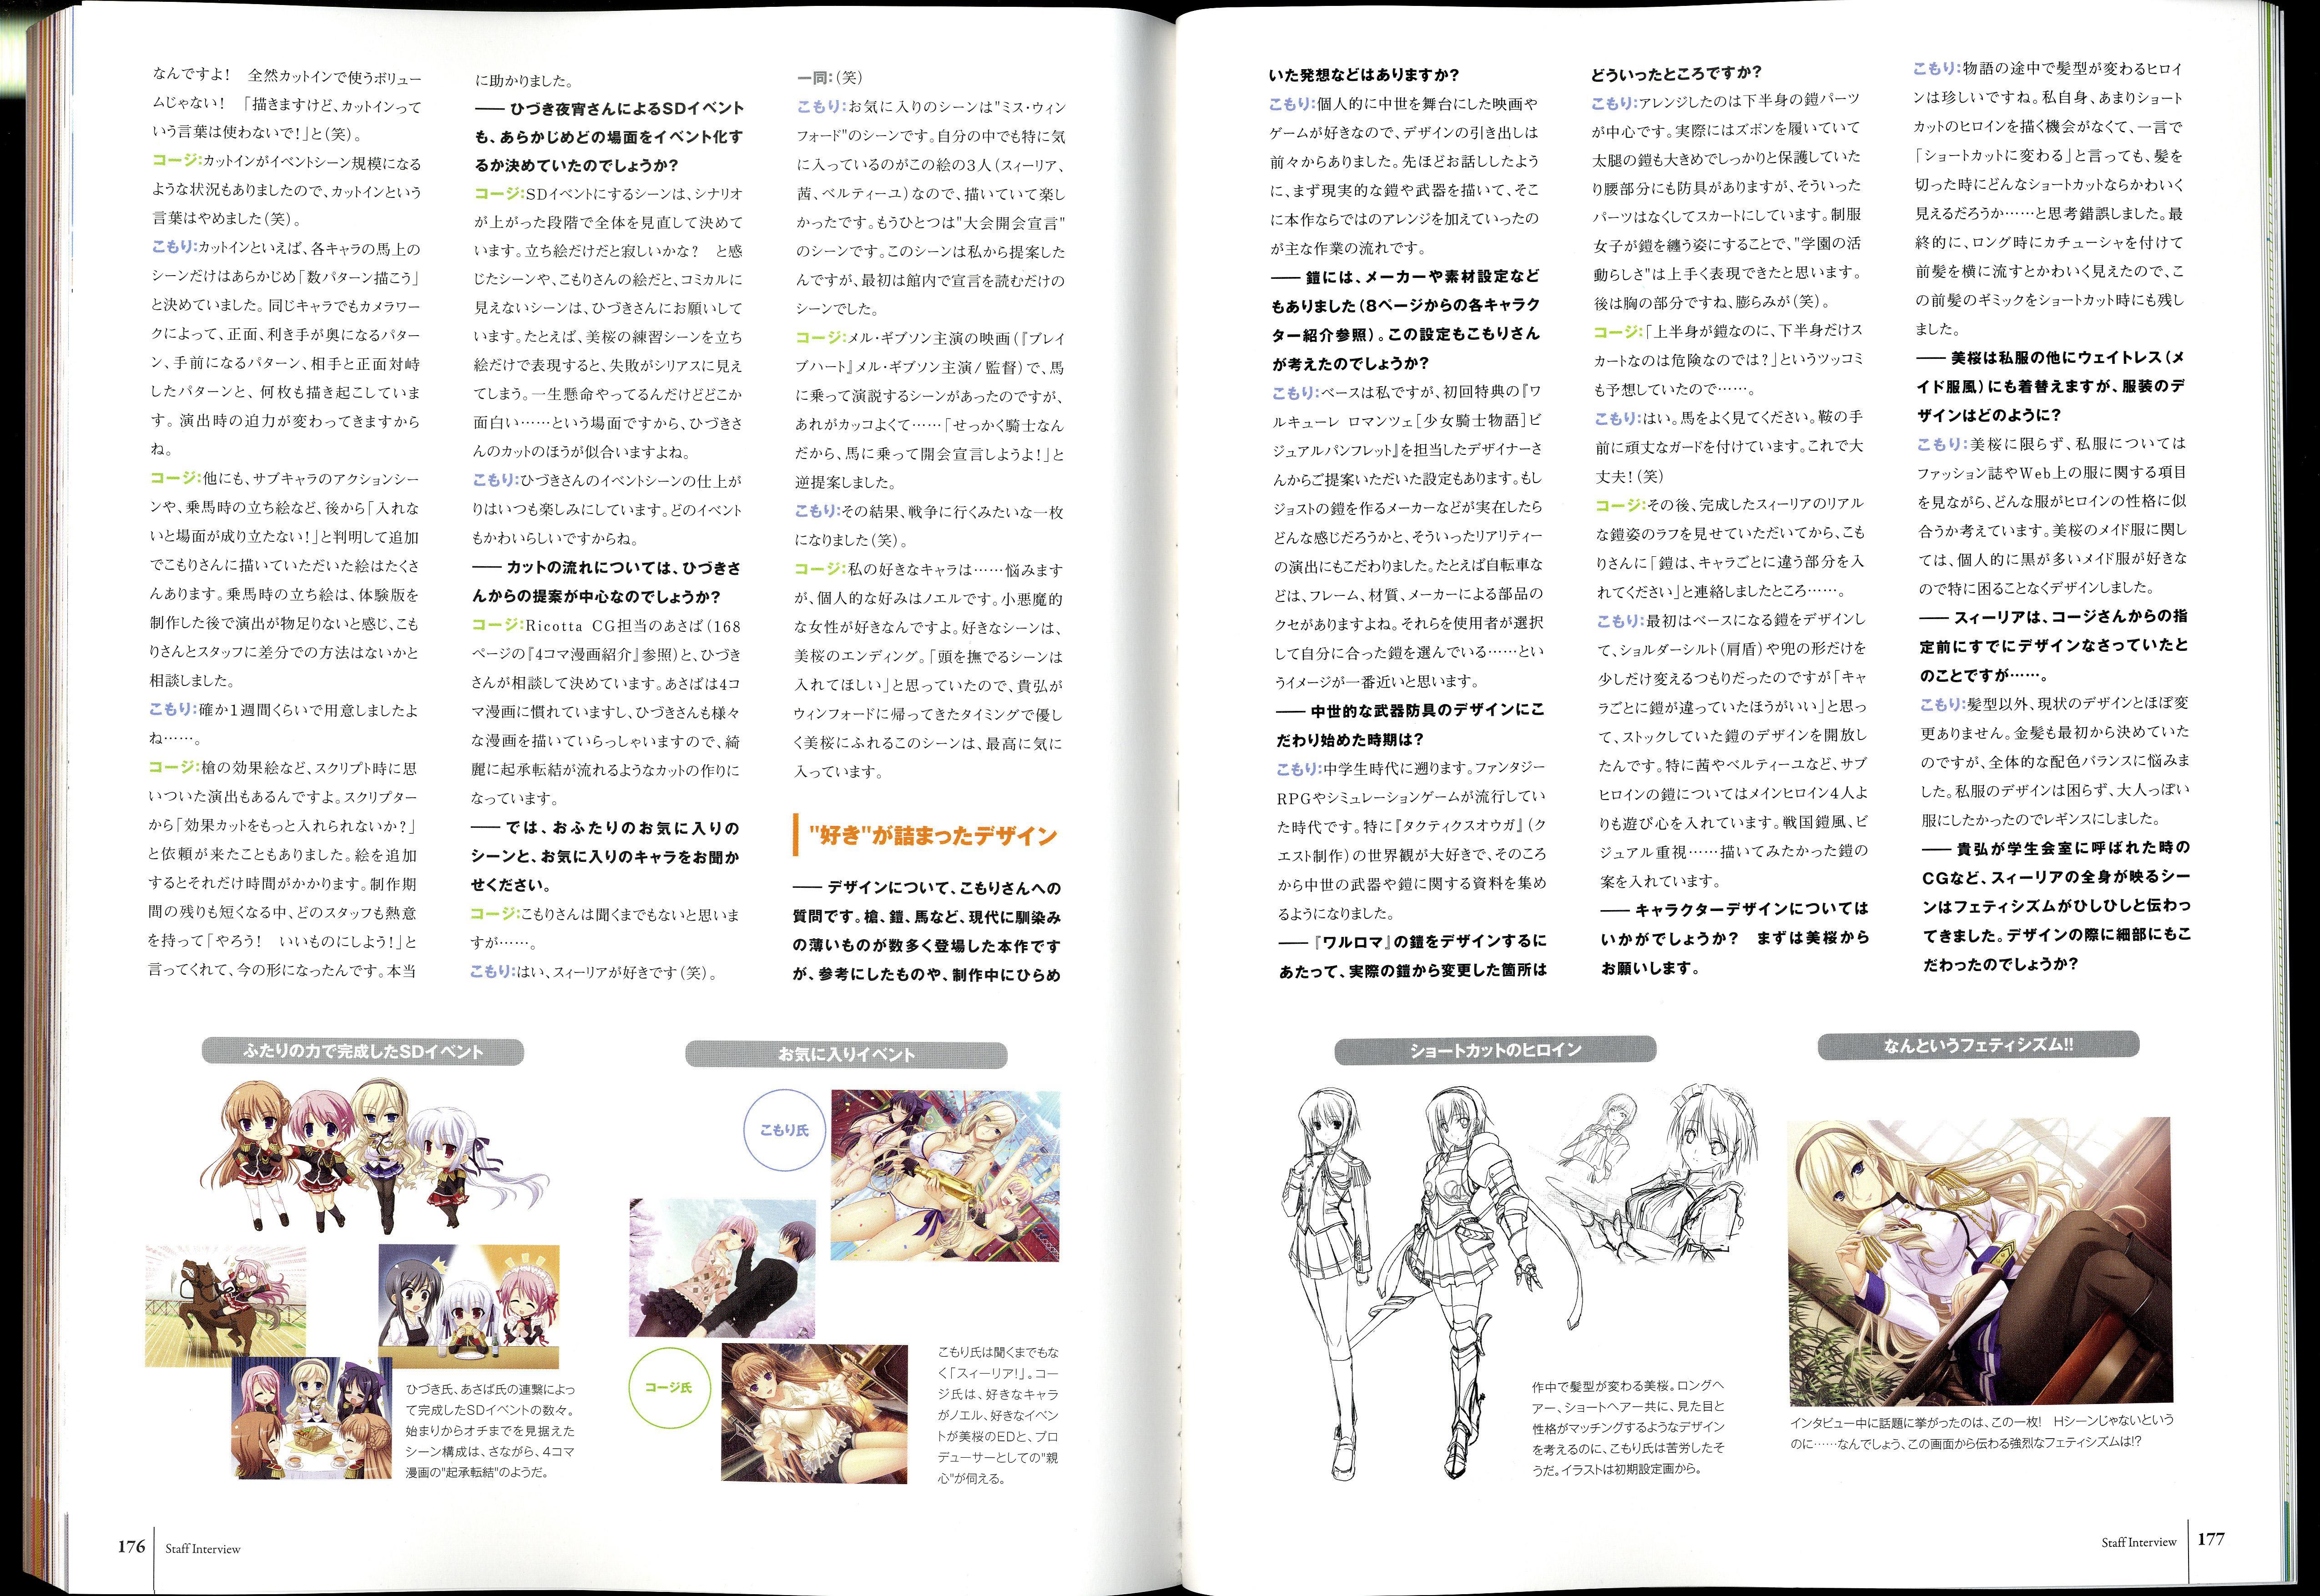 Walkure Romanze Visual Fanbook 95